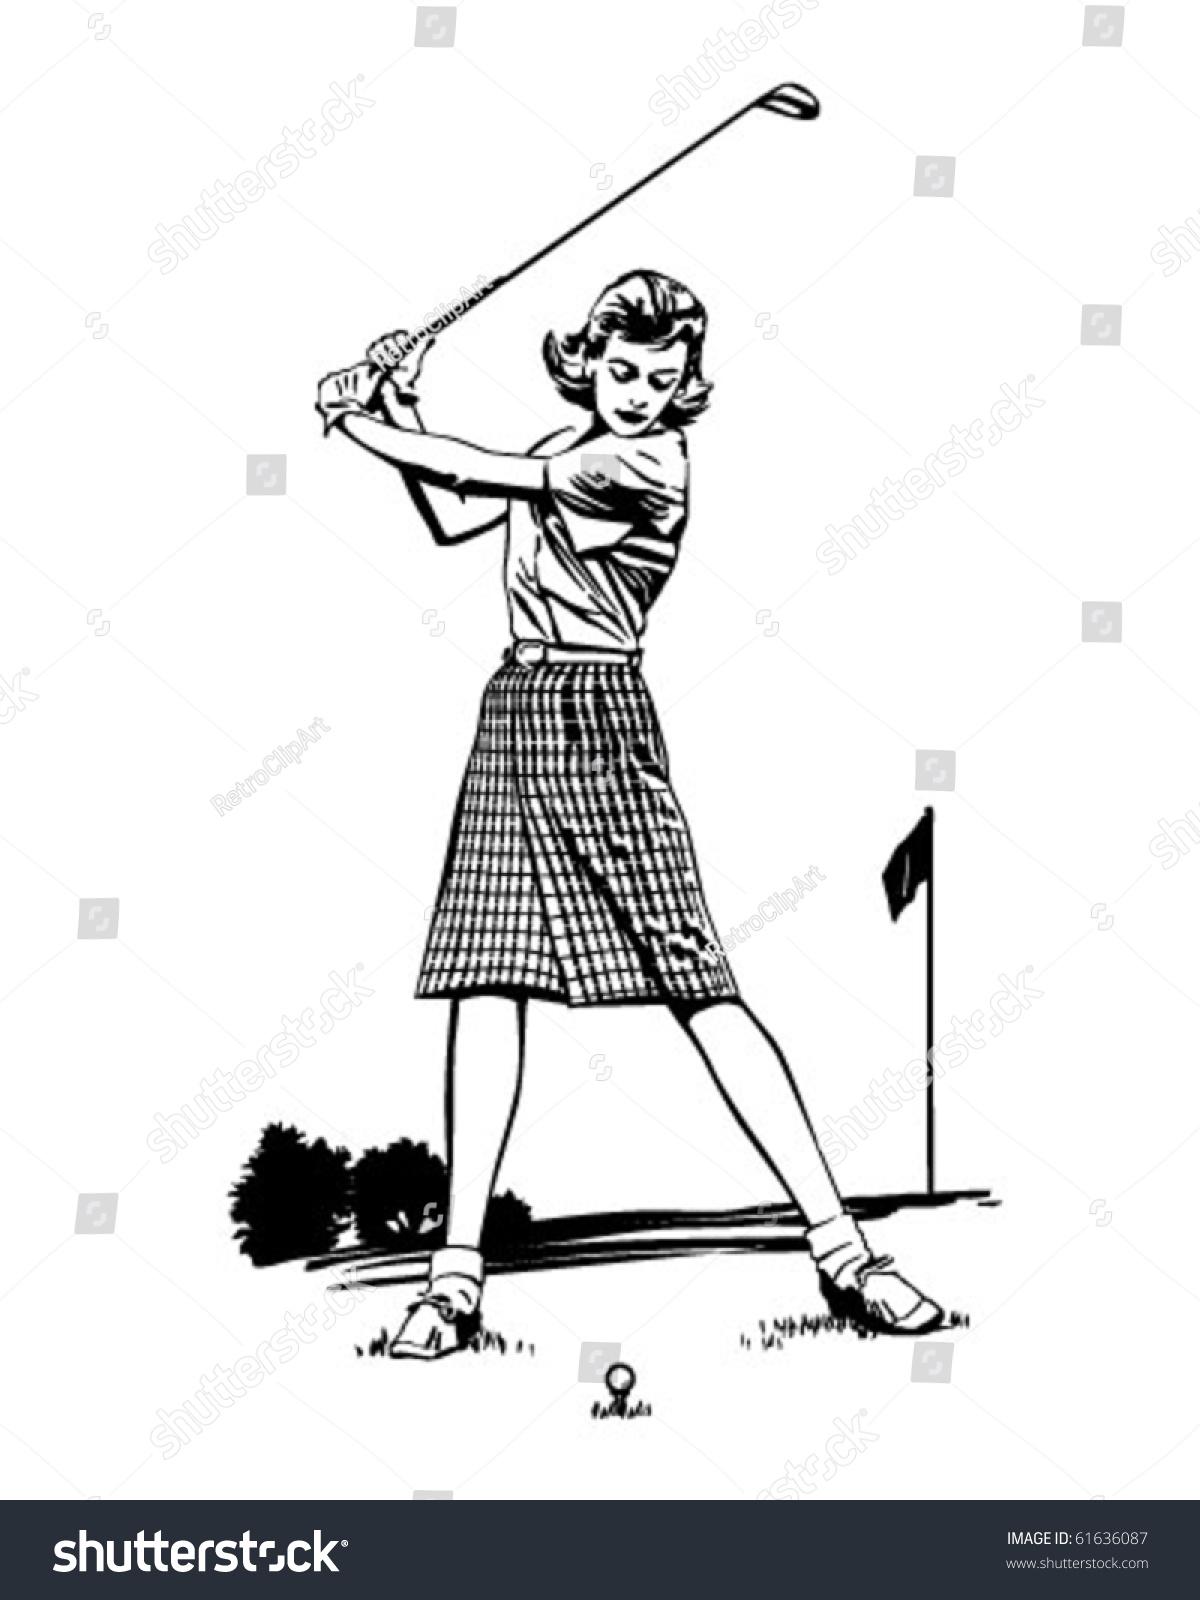 woman golfer 2 retro clip art stock vector 61636087 golf ball tee clip art golf tee box clip art